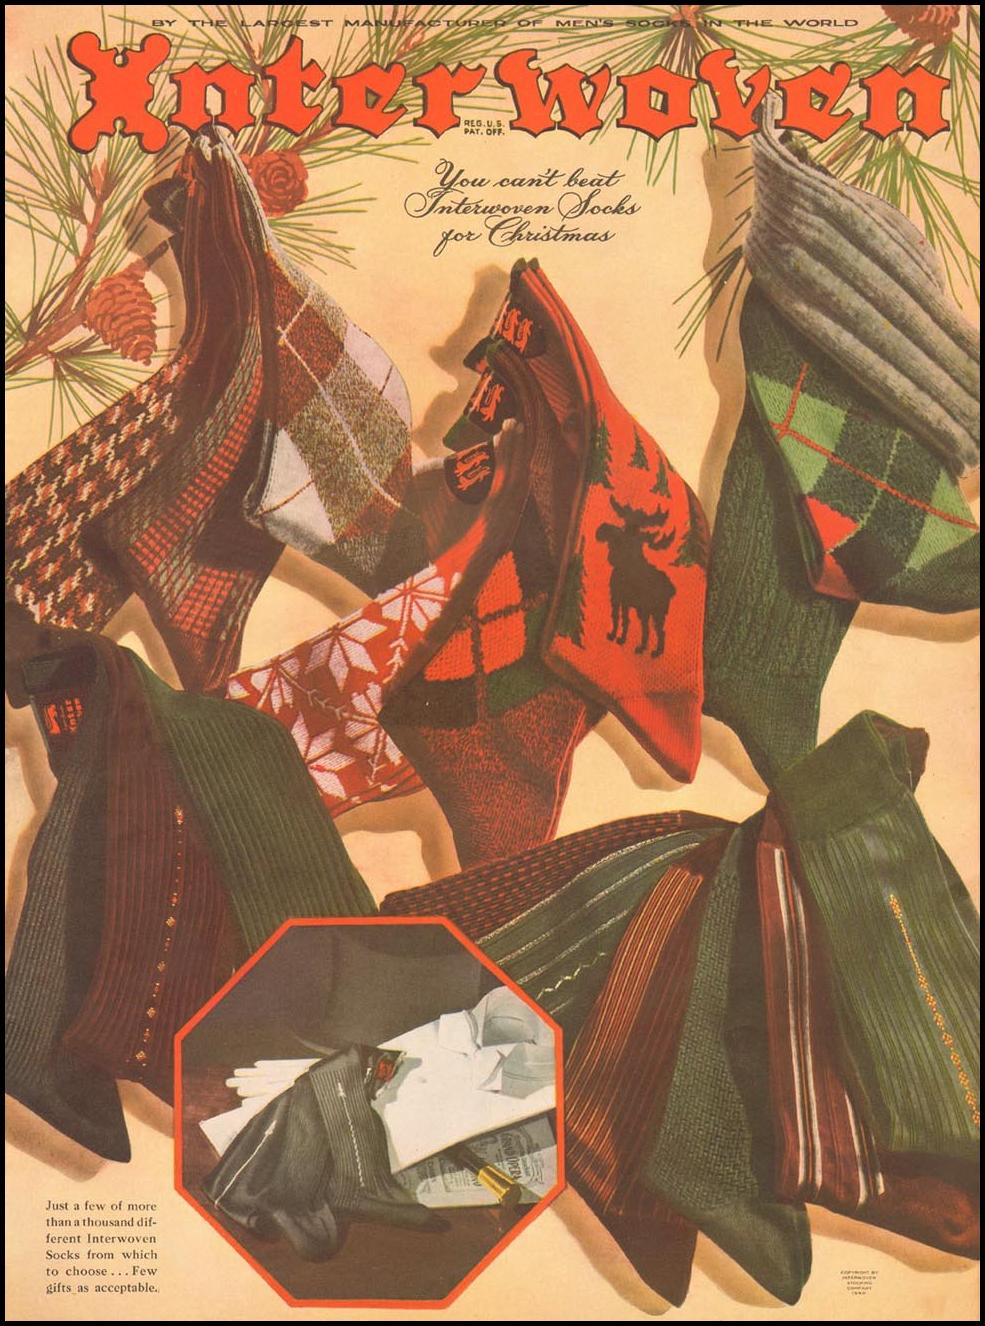 INTERWOVEN SOCKS LIFE 12/16/1940 p. 37